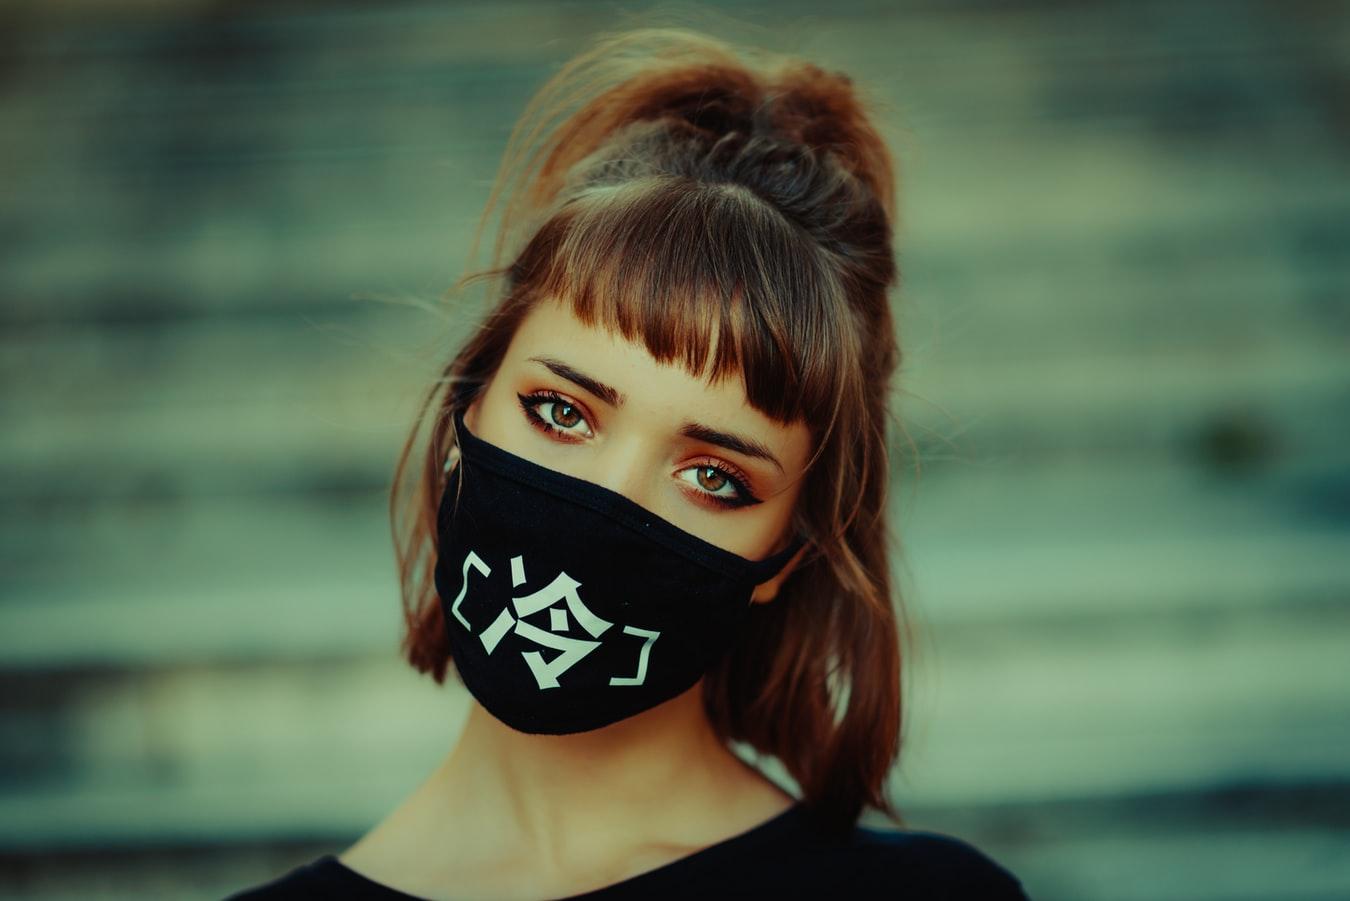 maskne - ακμή από την μάσκα